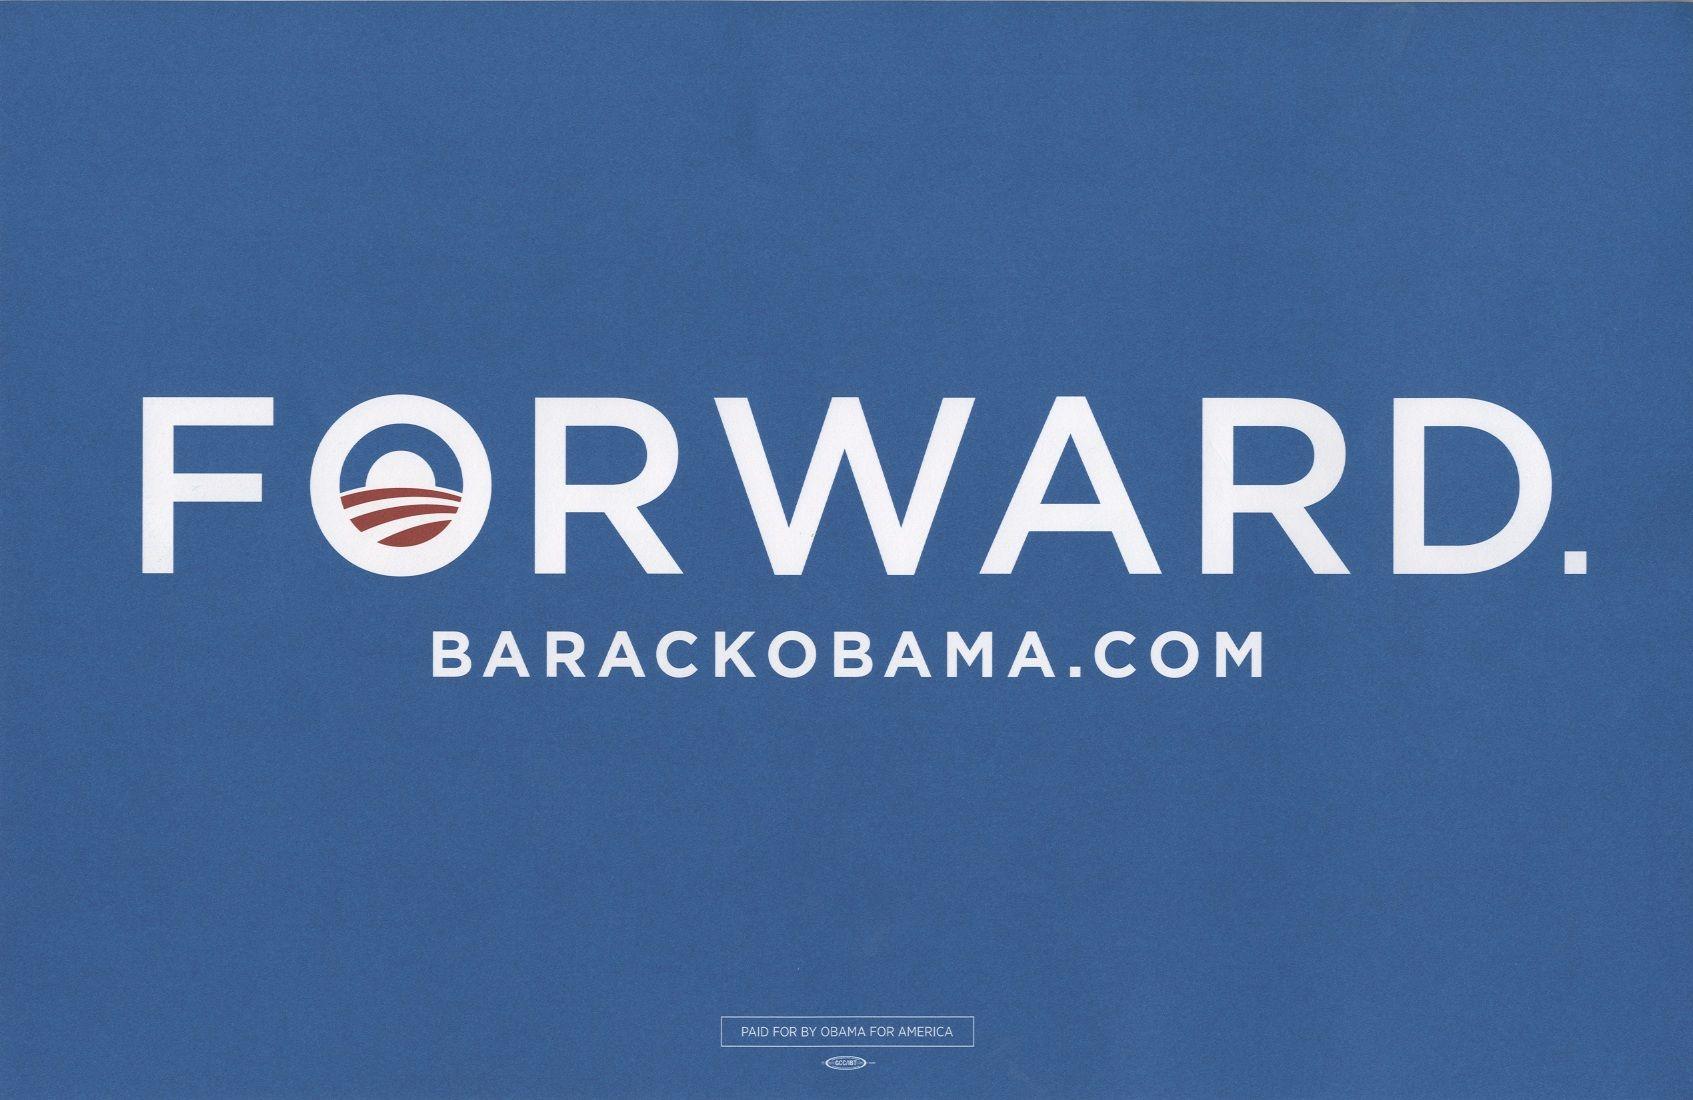 Barack obamas campaign signage obama campaign barack